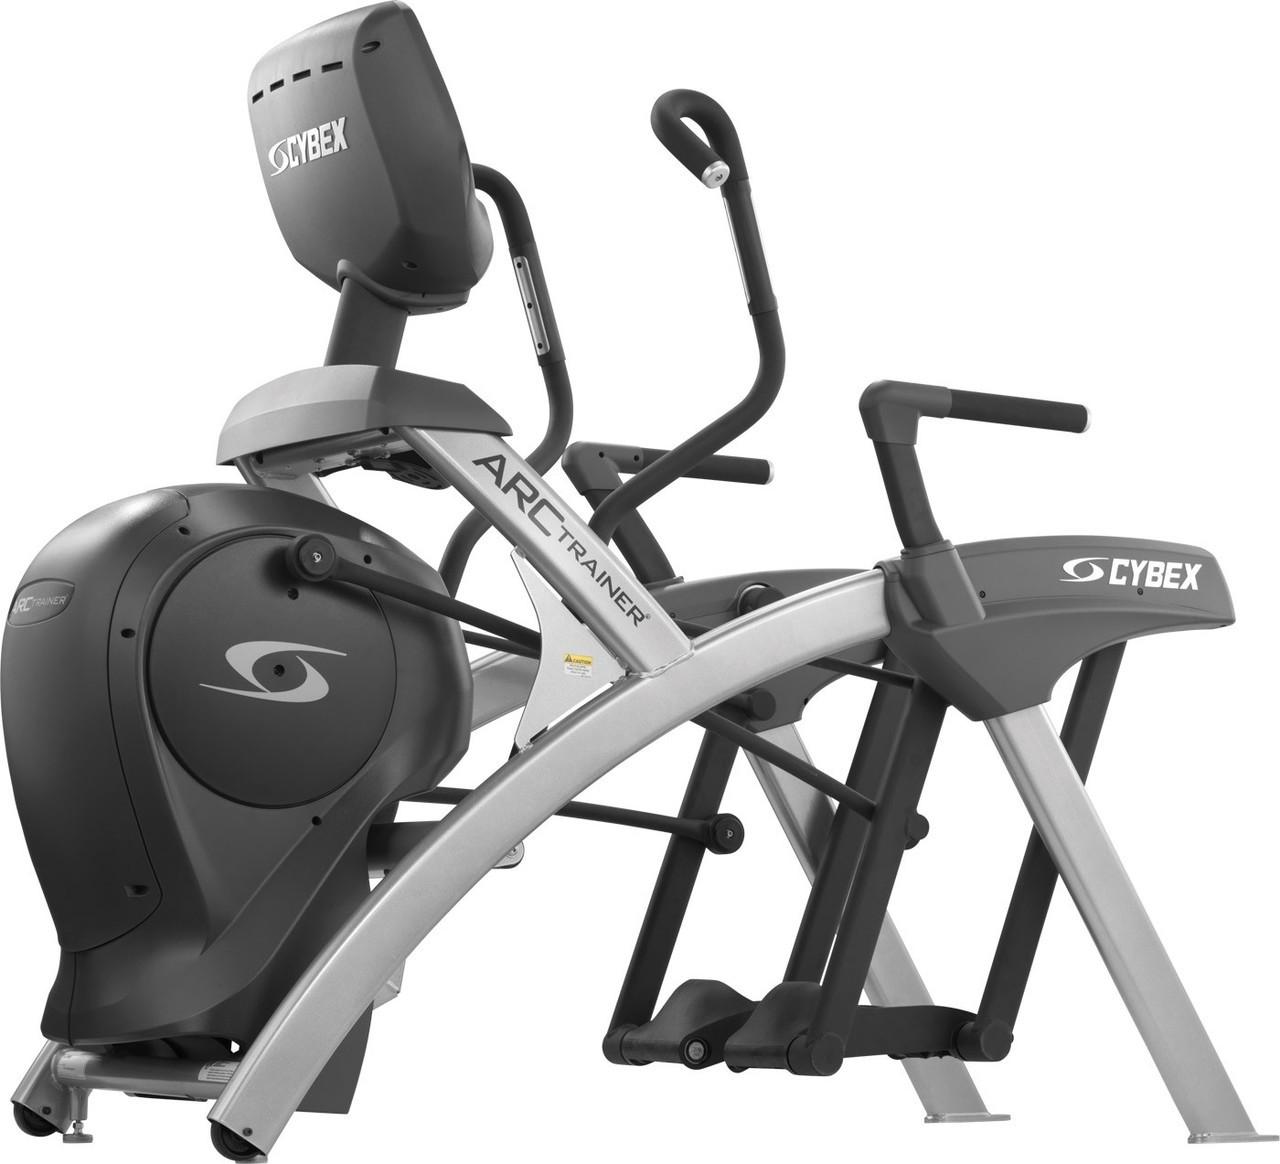 Cybex 770 AT total body Arc trainer e3 console 772